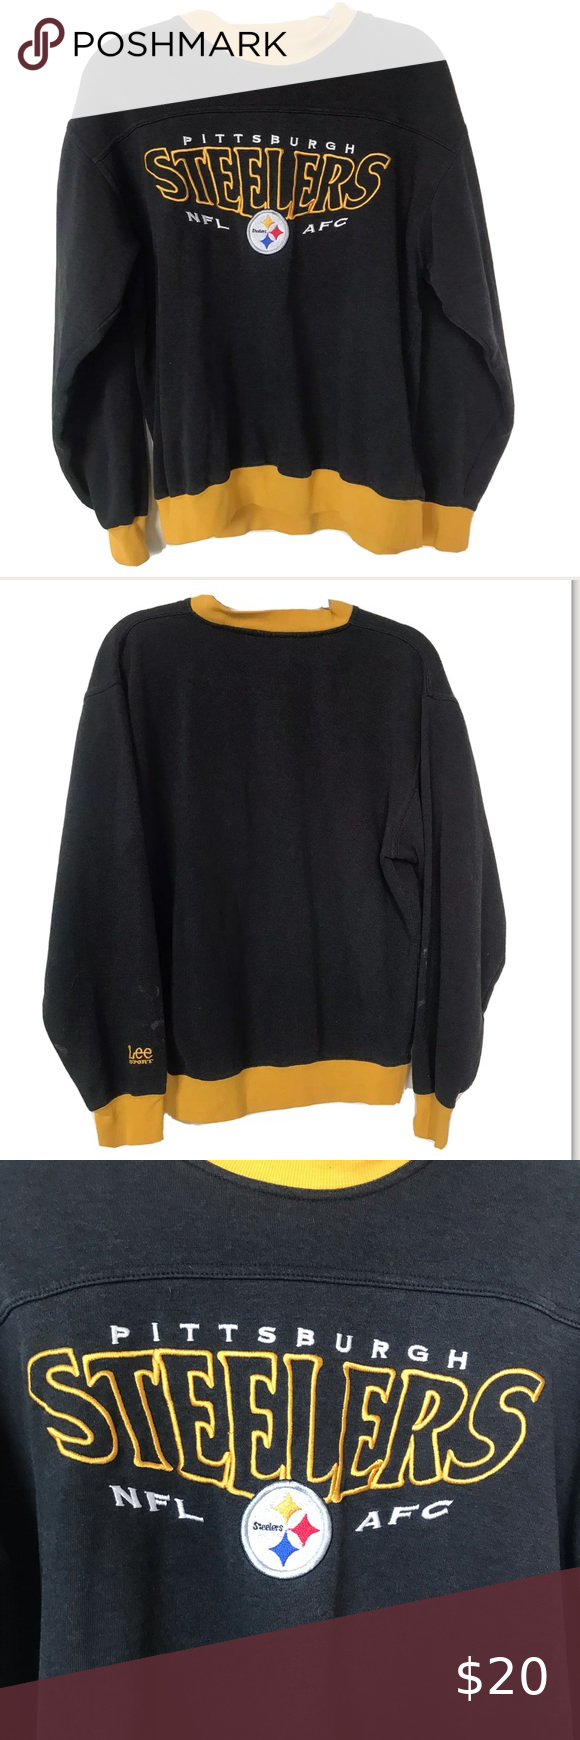 Lee Crew Sweatshirt Pitch Black Zalando Co Uk Long Sleeve Tshirt Men Crew Sweatshirts Sweatshirts [ 1100 x 762 Pixel ]